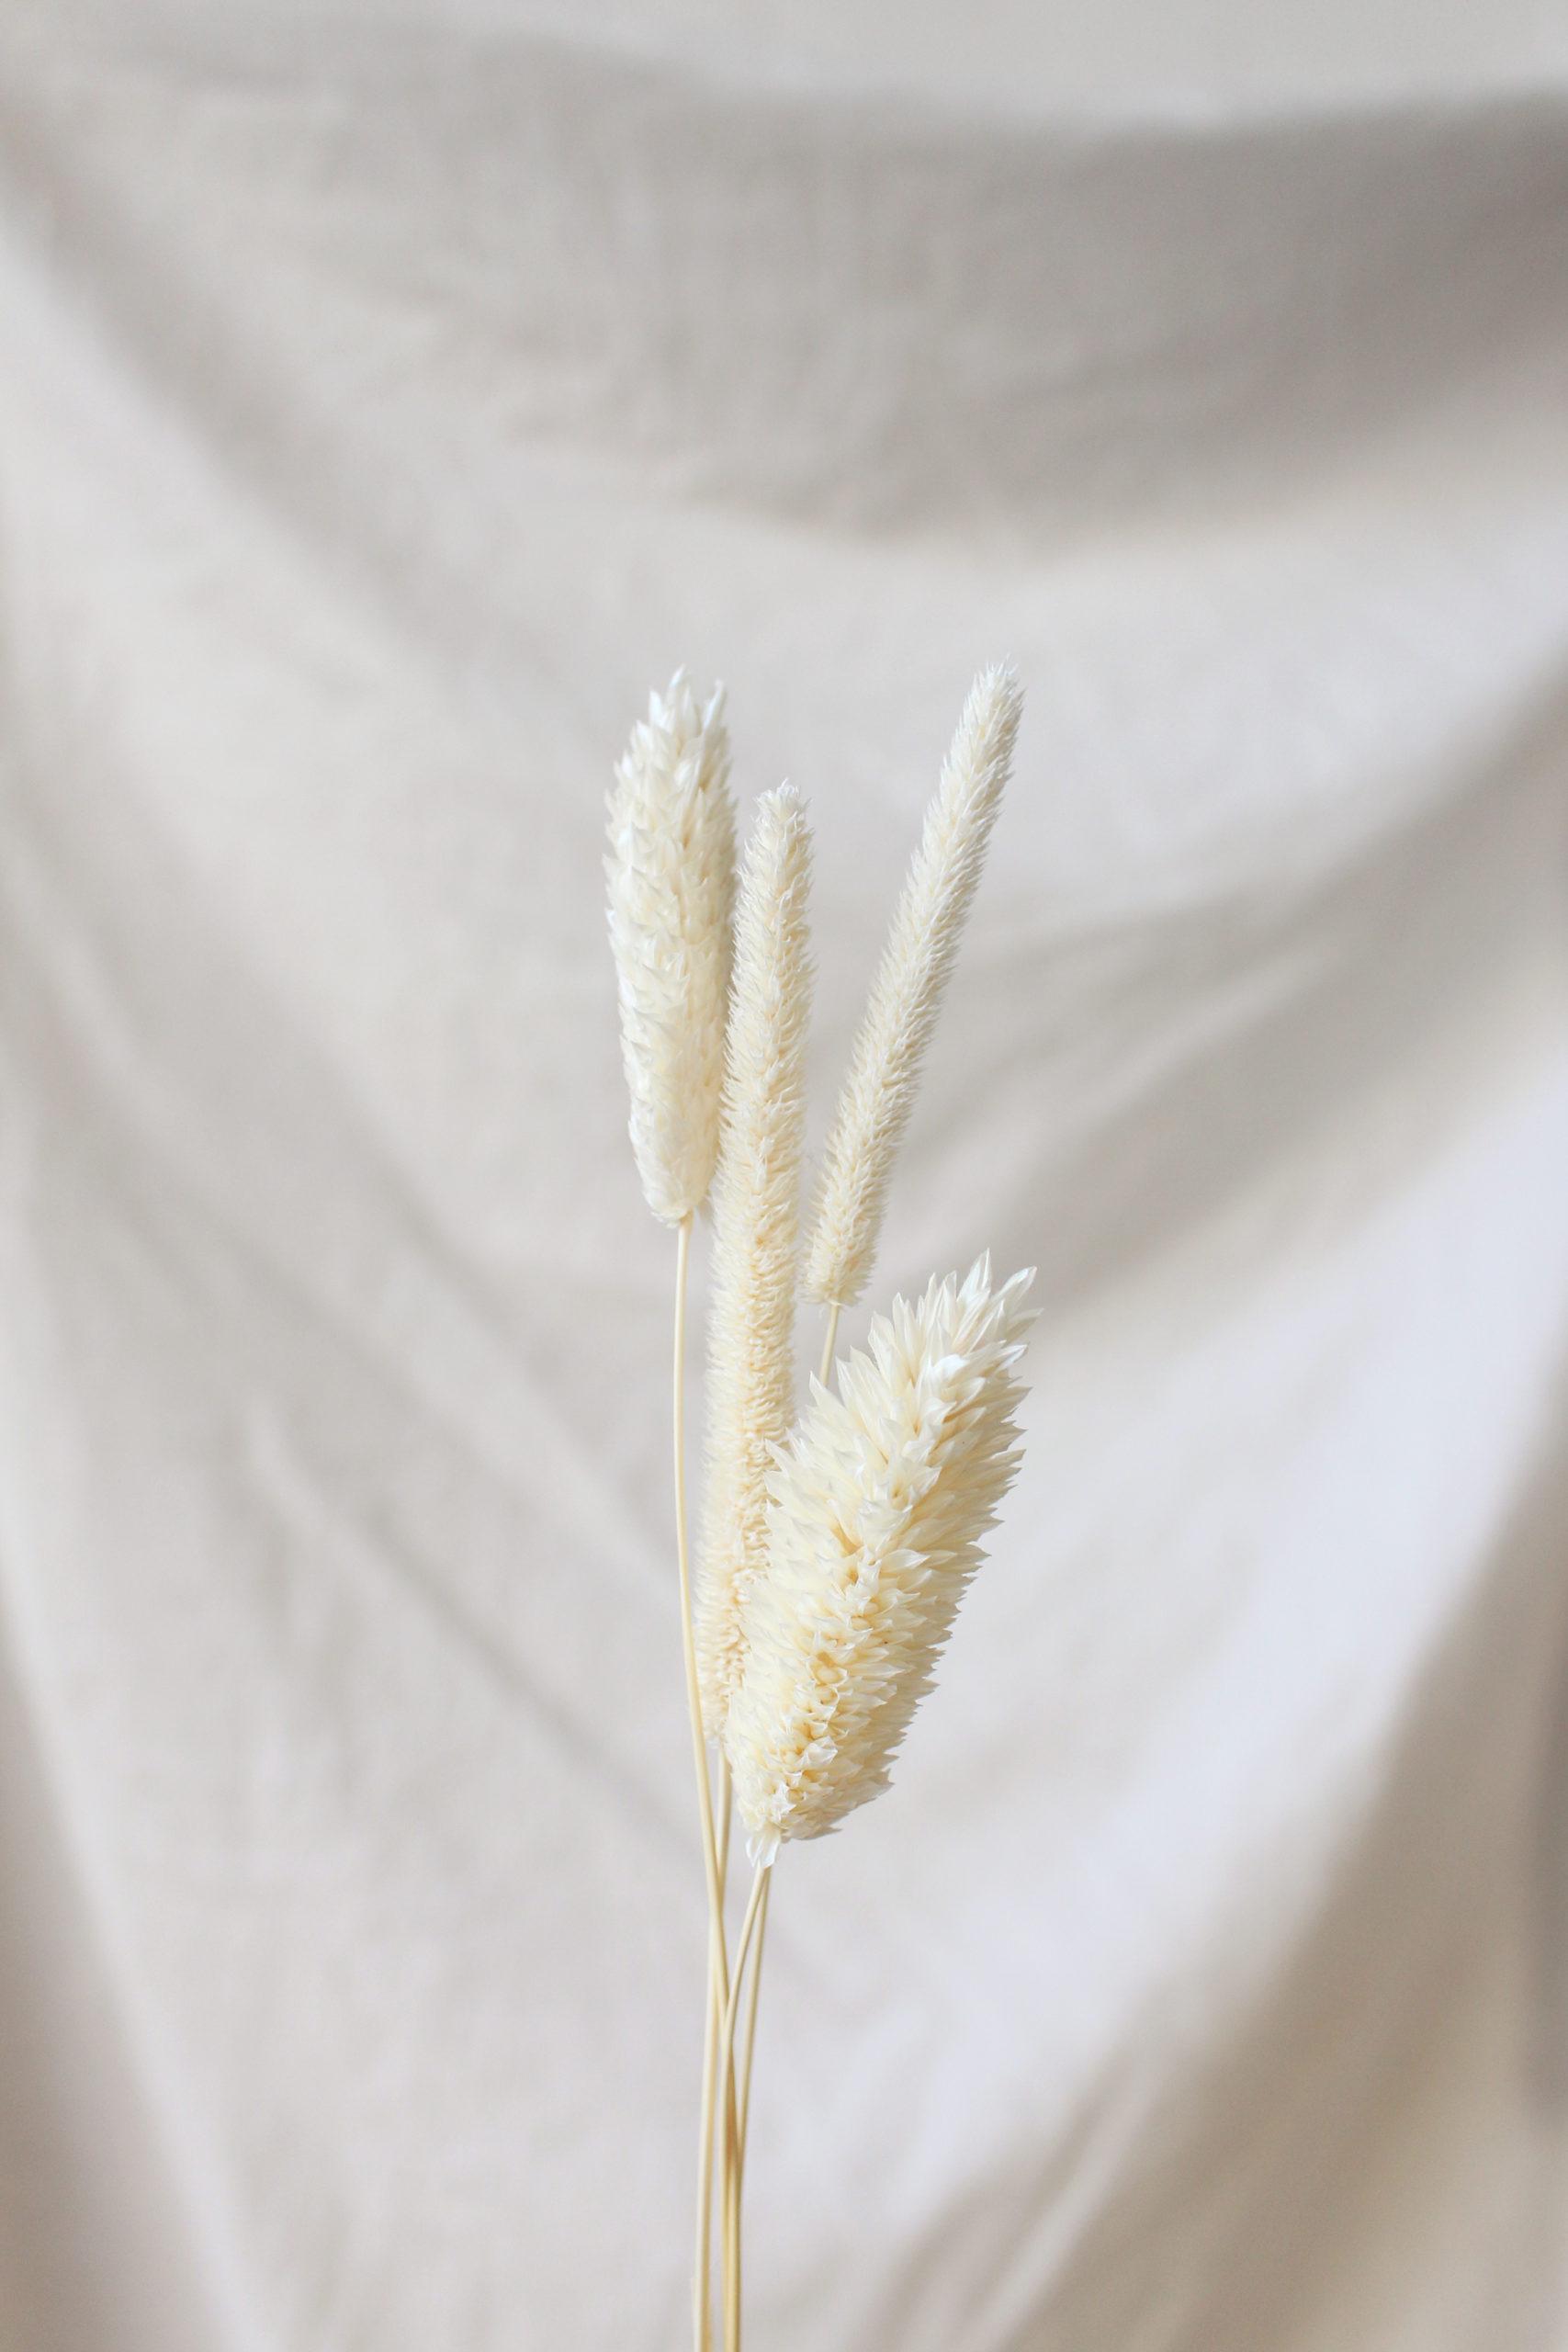 Moodbild mit Trockenpflanzen